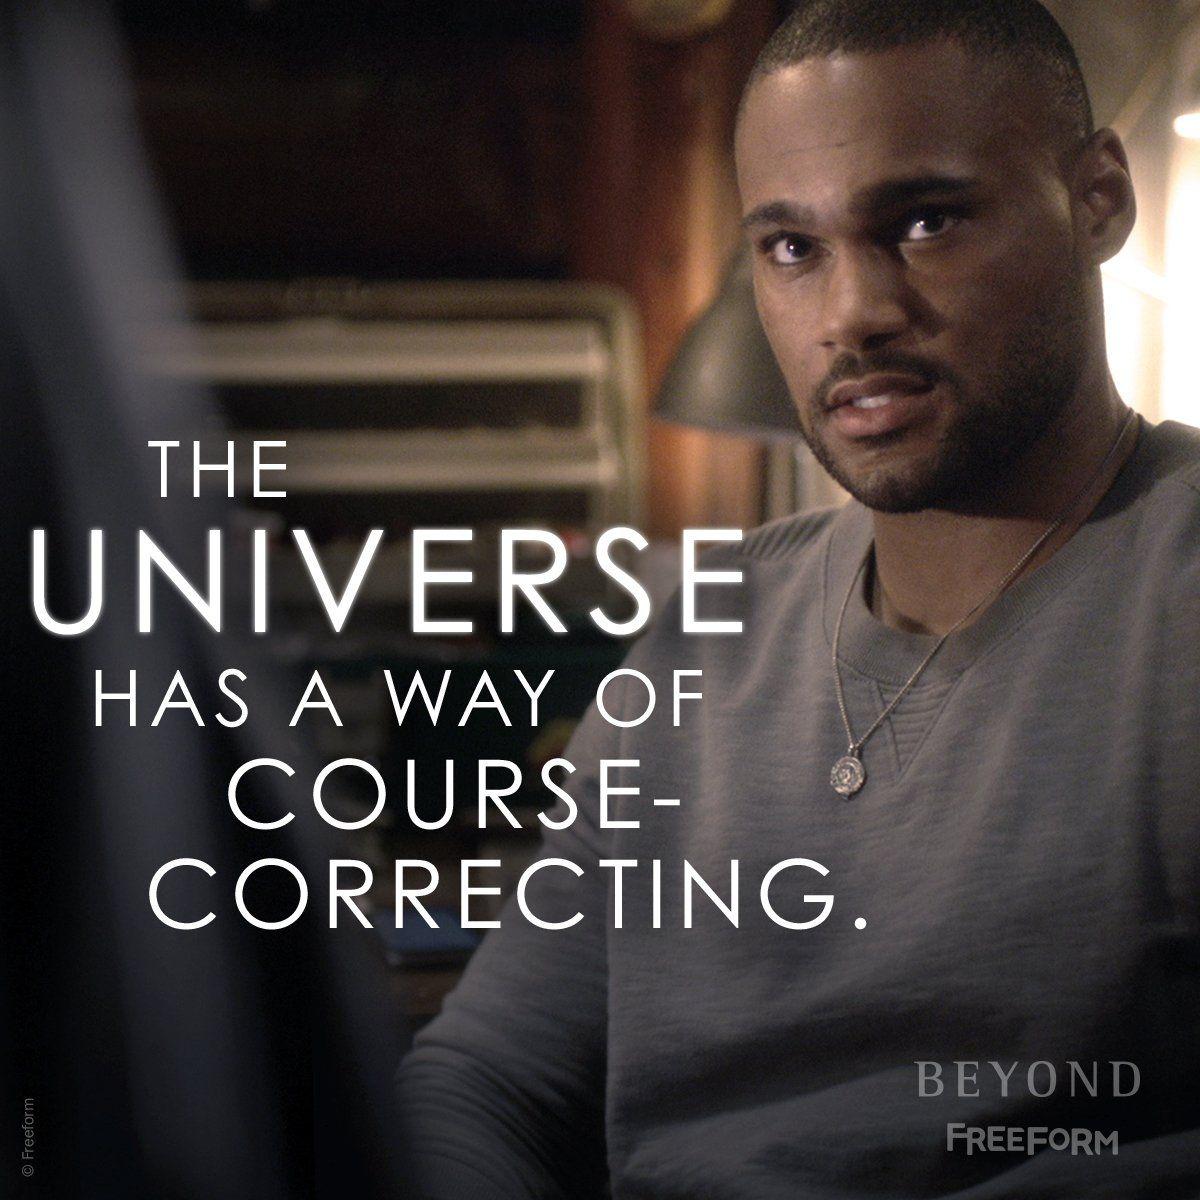 Beyond It talks to you. Beyond Tv series memes